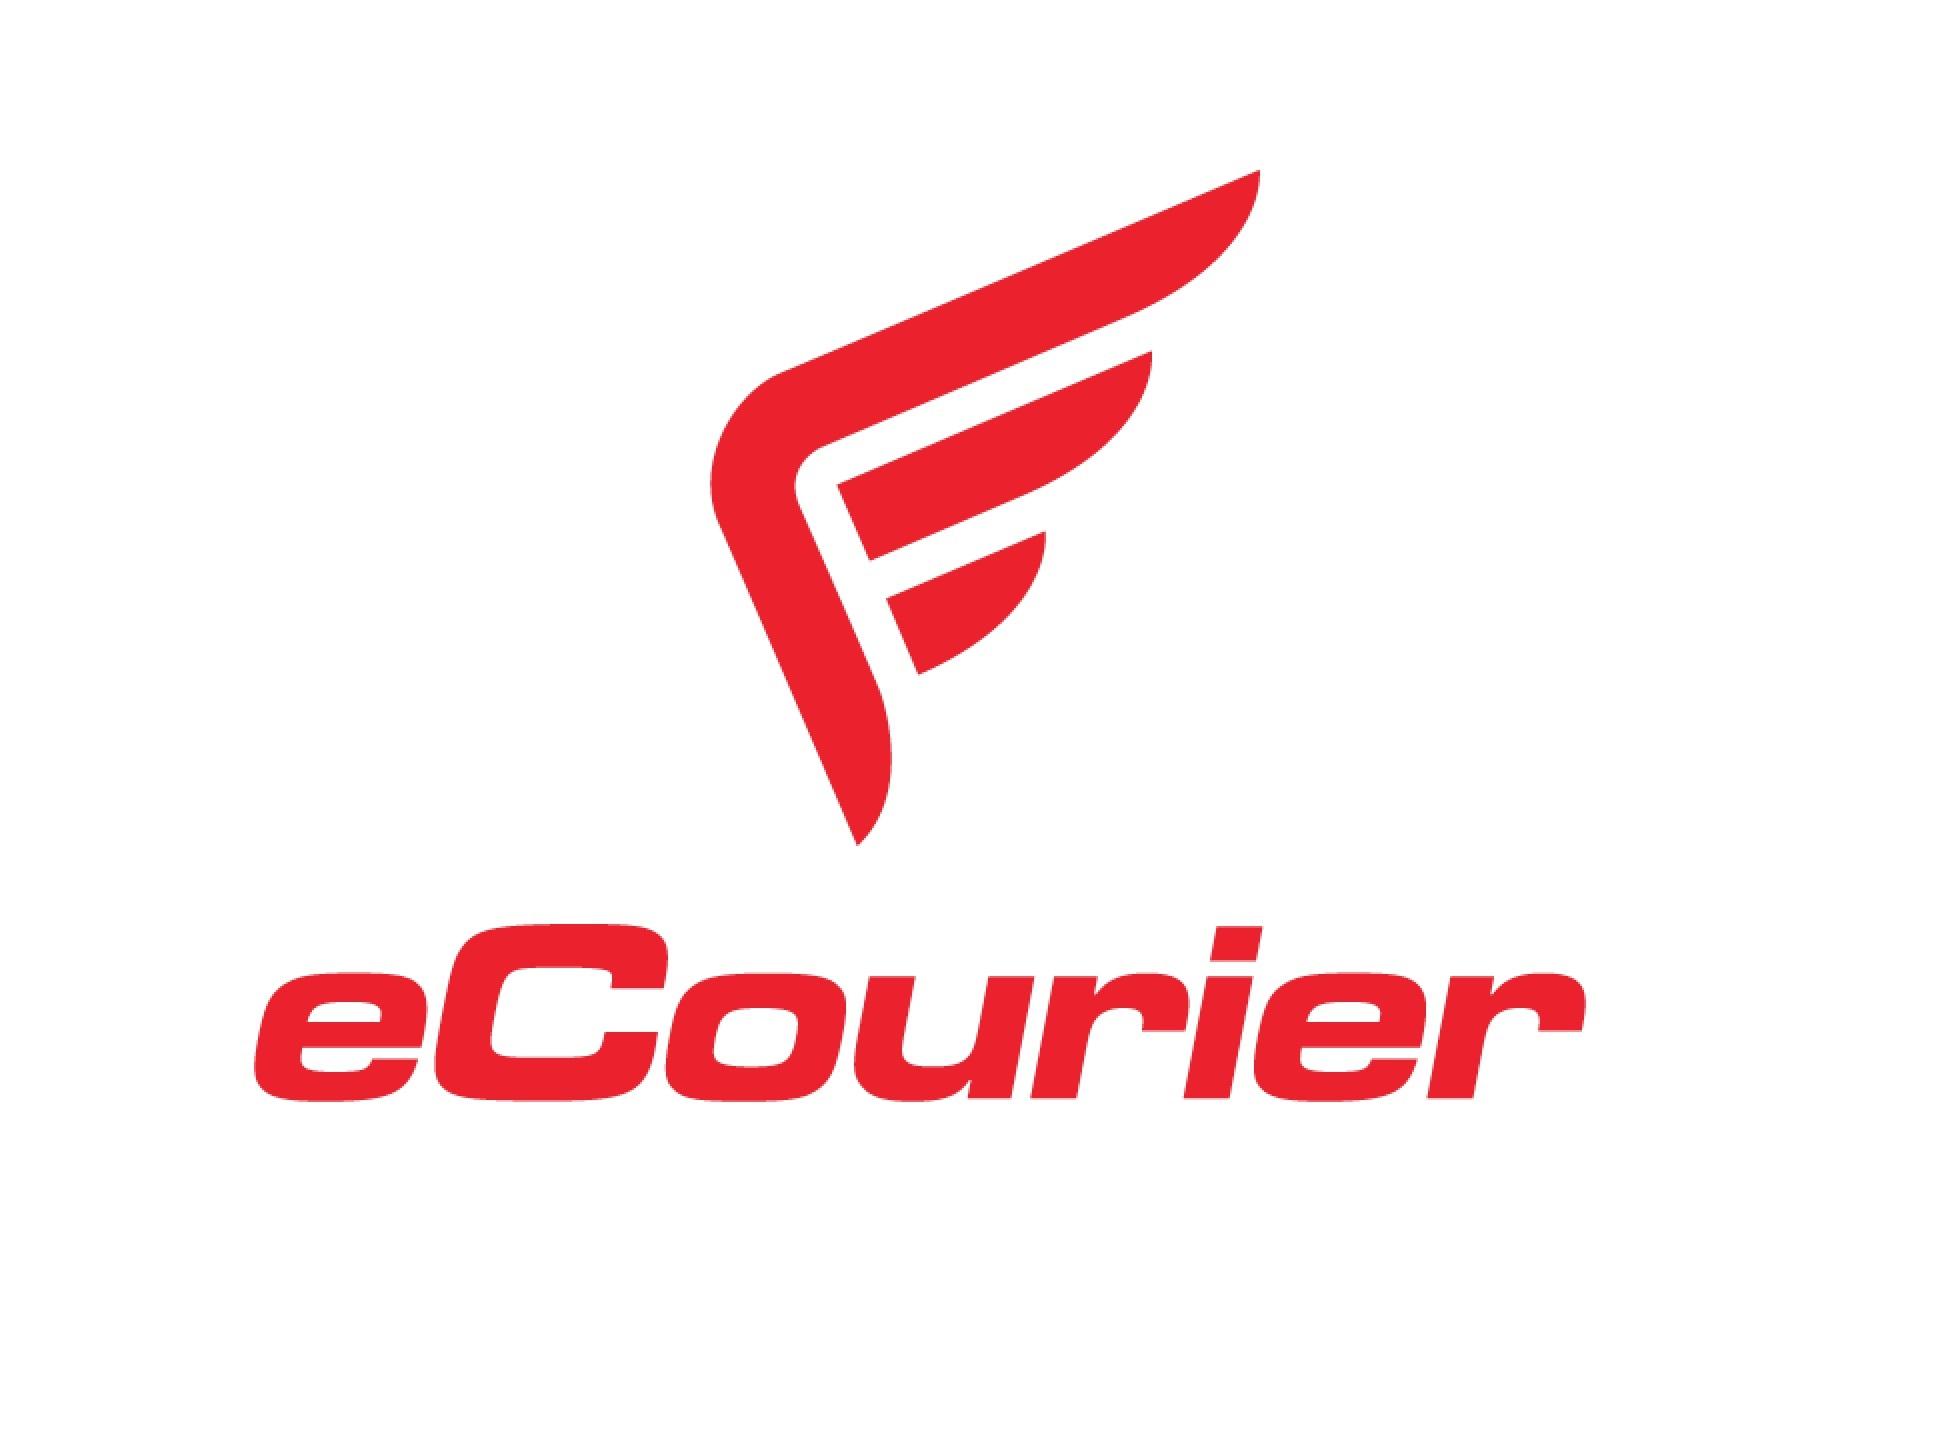 eCourier-logo-toate-site-urile